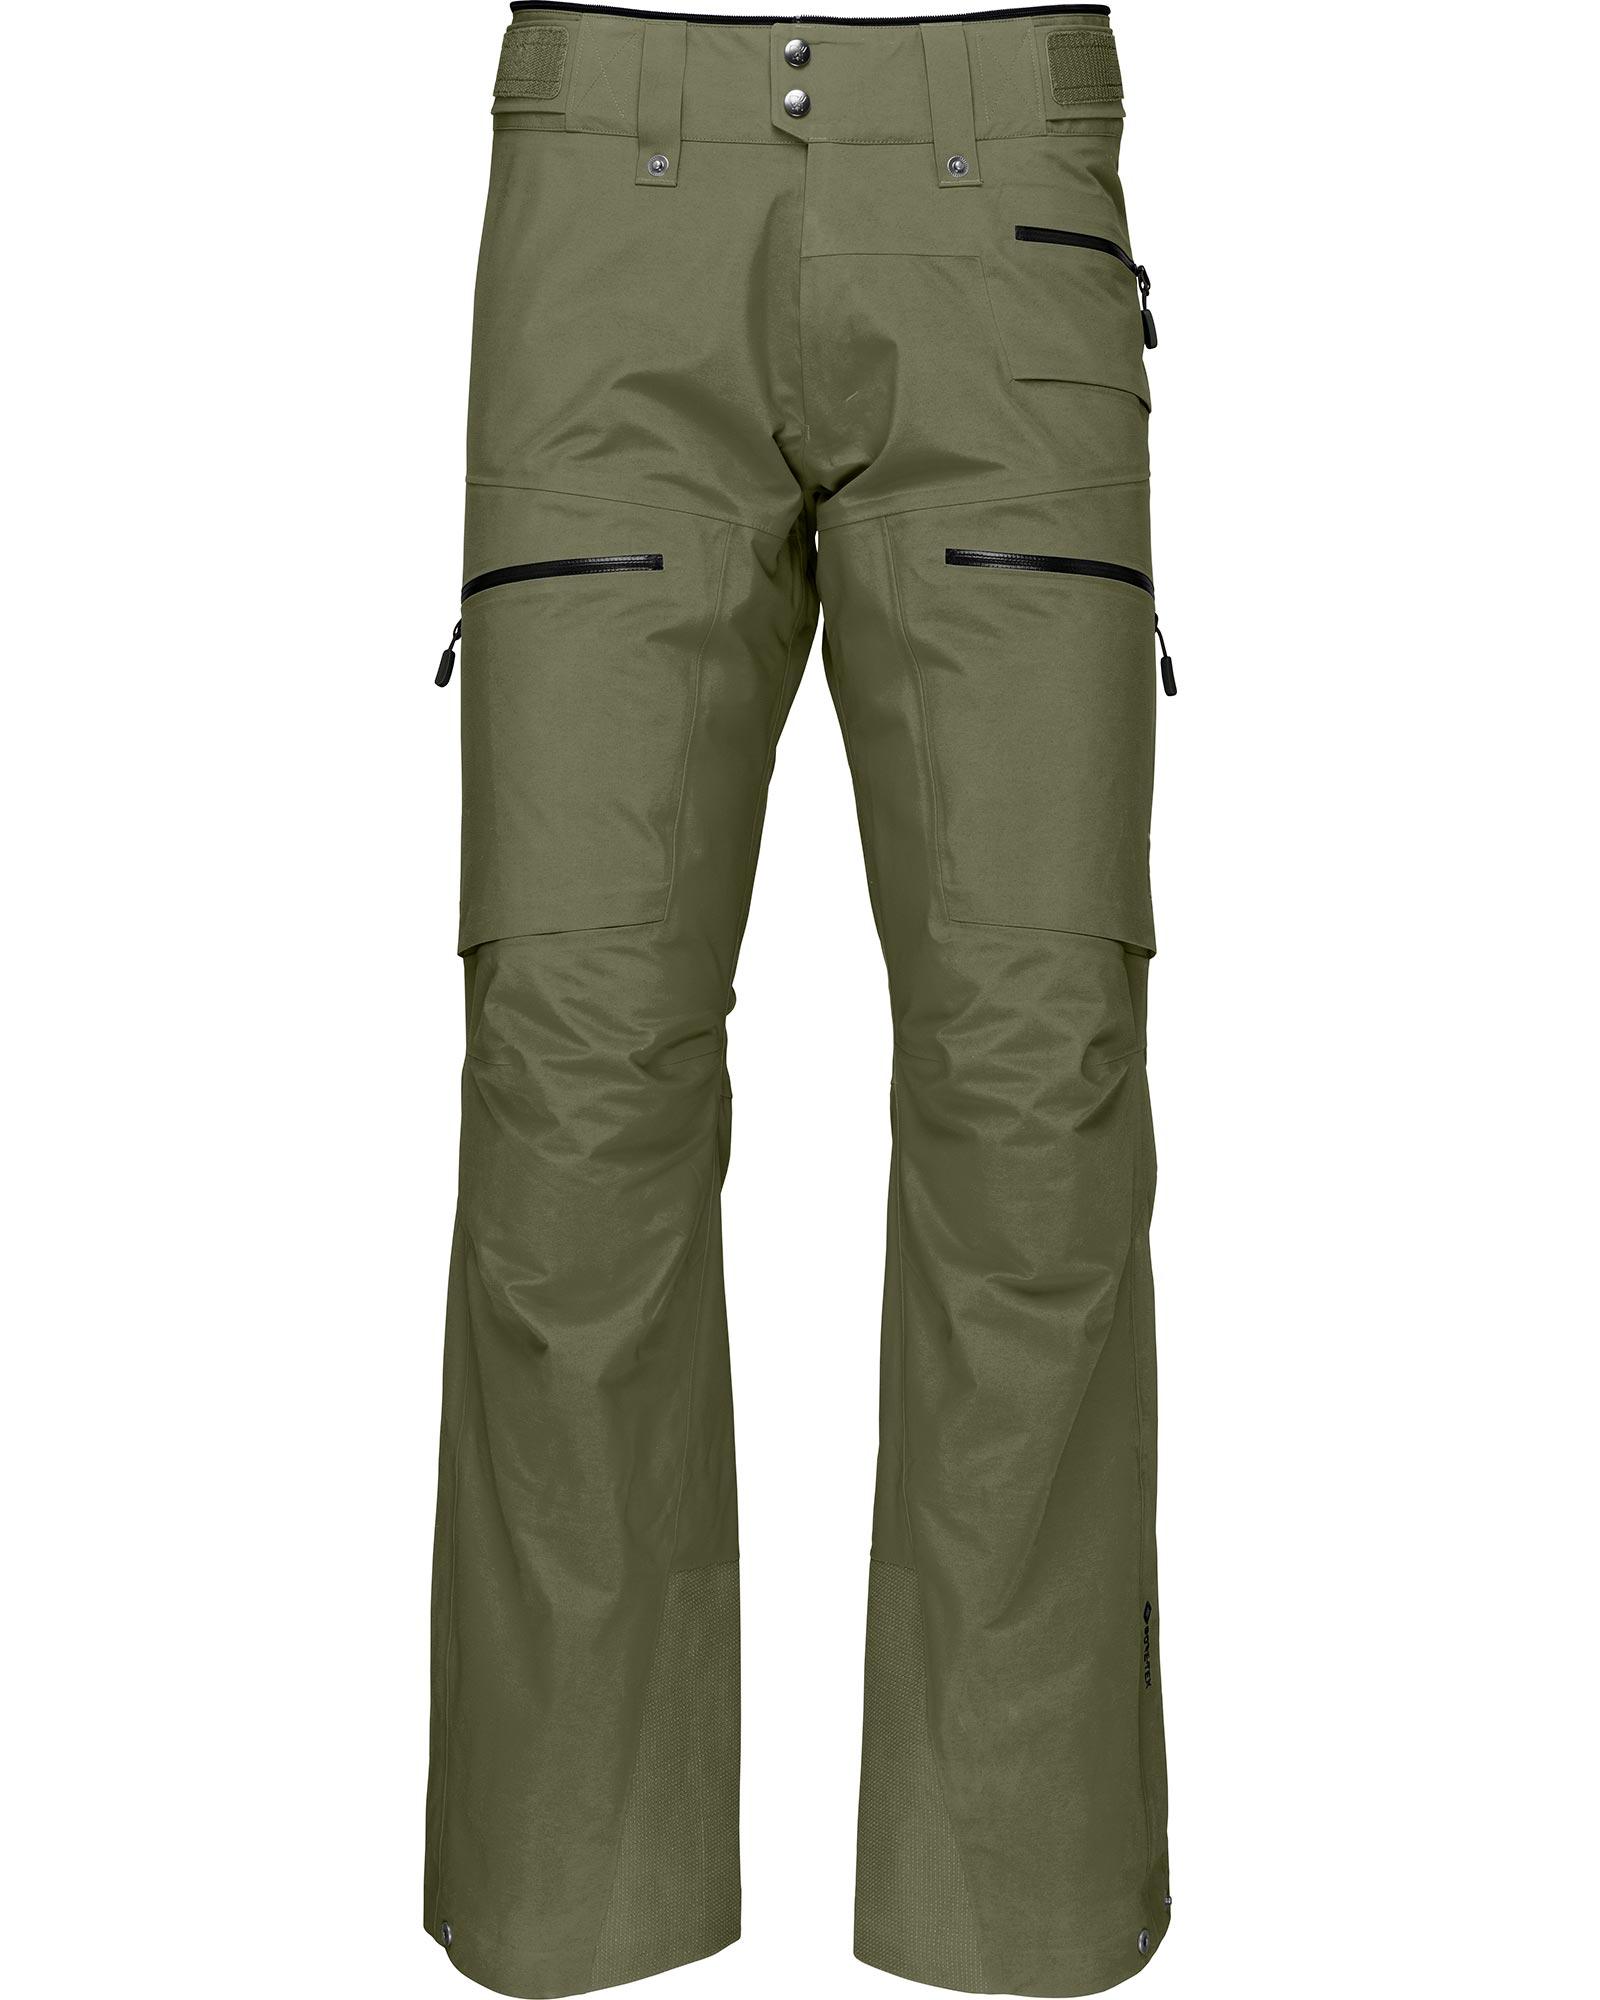 Norrona Men's Lofoten GORE-TEX 3L Ski Pants 0